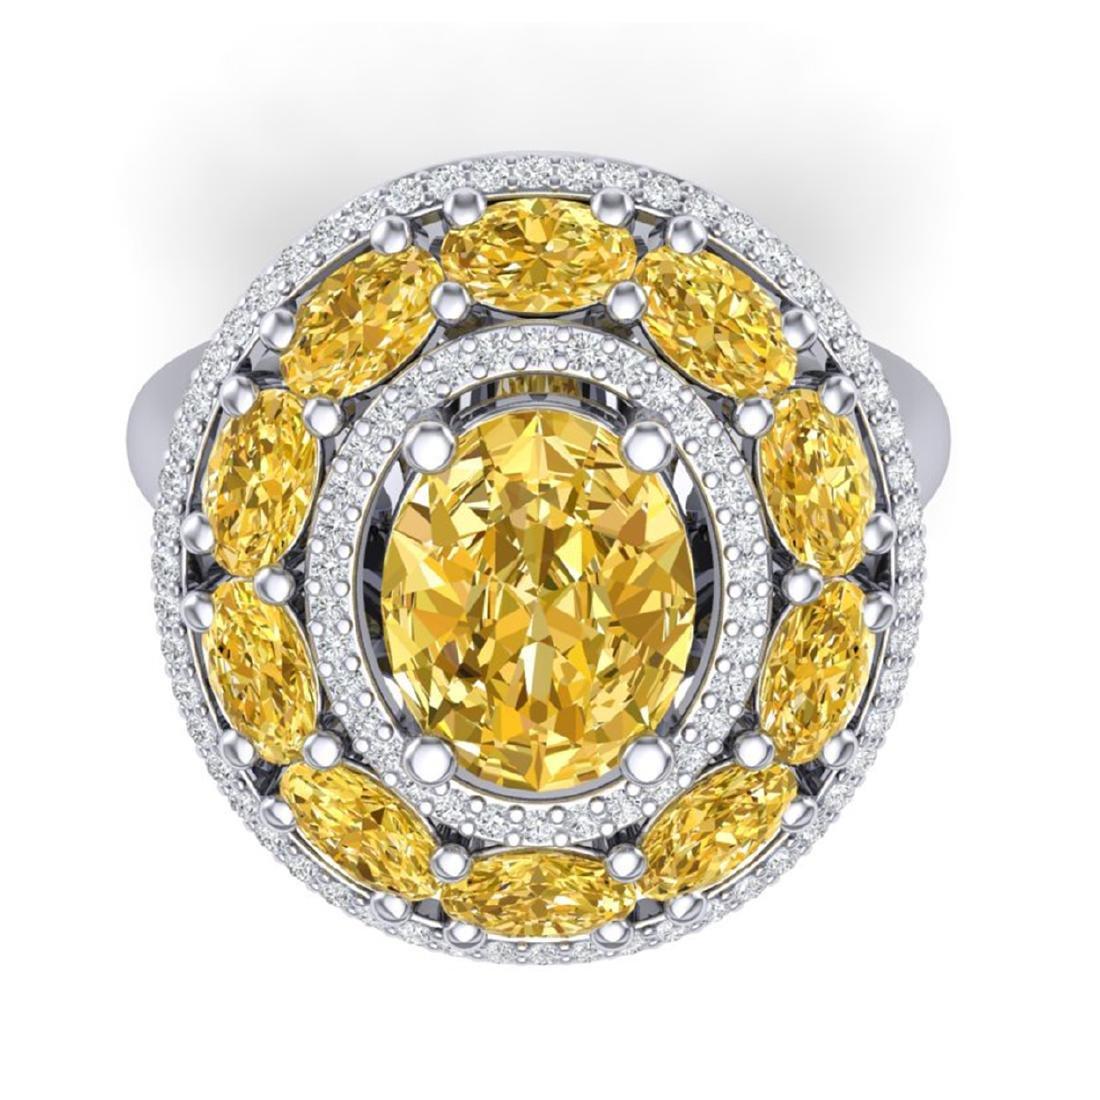 7.21 ctw Canary Citrine & VS Diamond Ring 18K White - 2